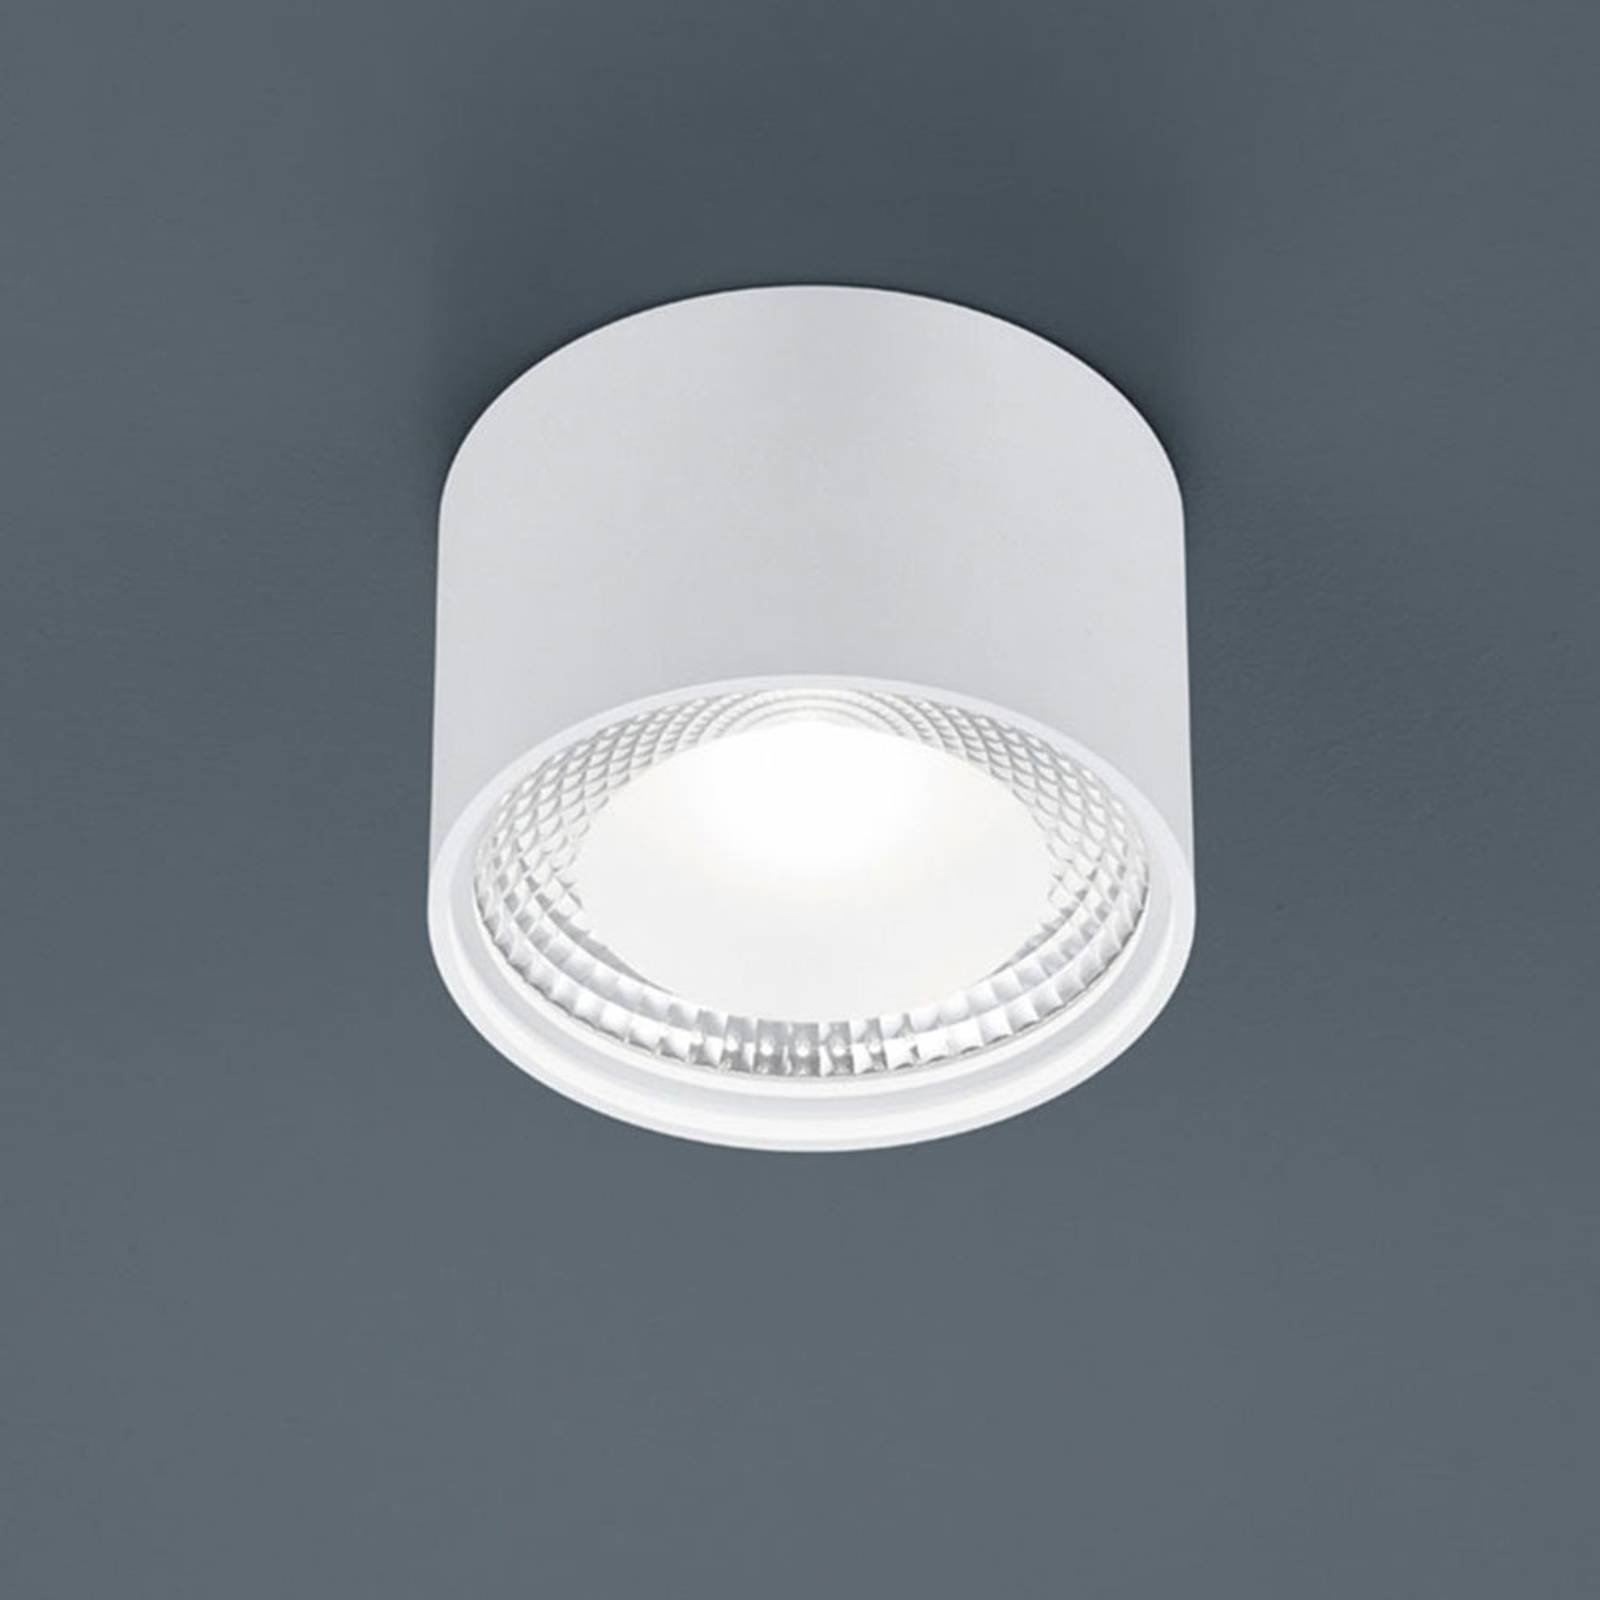 Helestra Kari LED-taklampe, rund, hvit